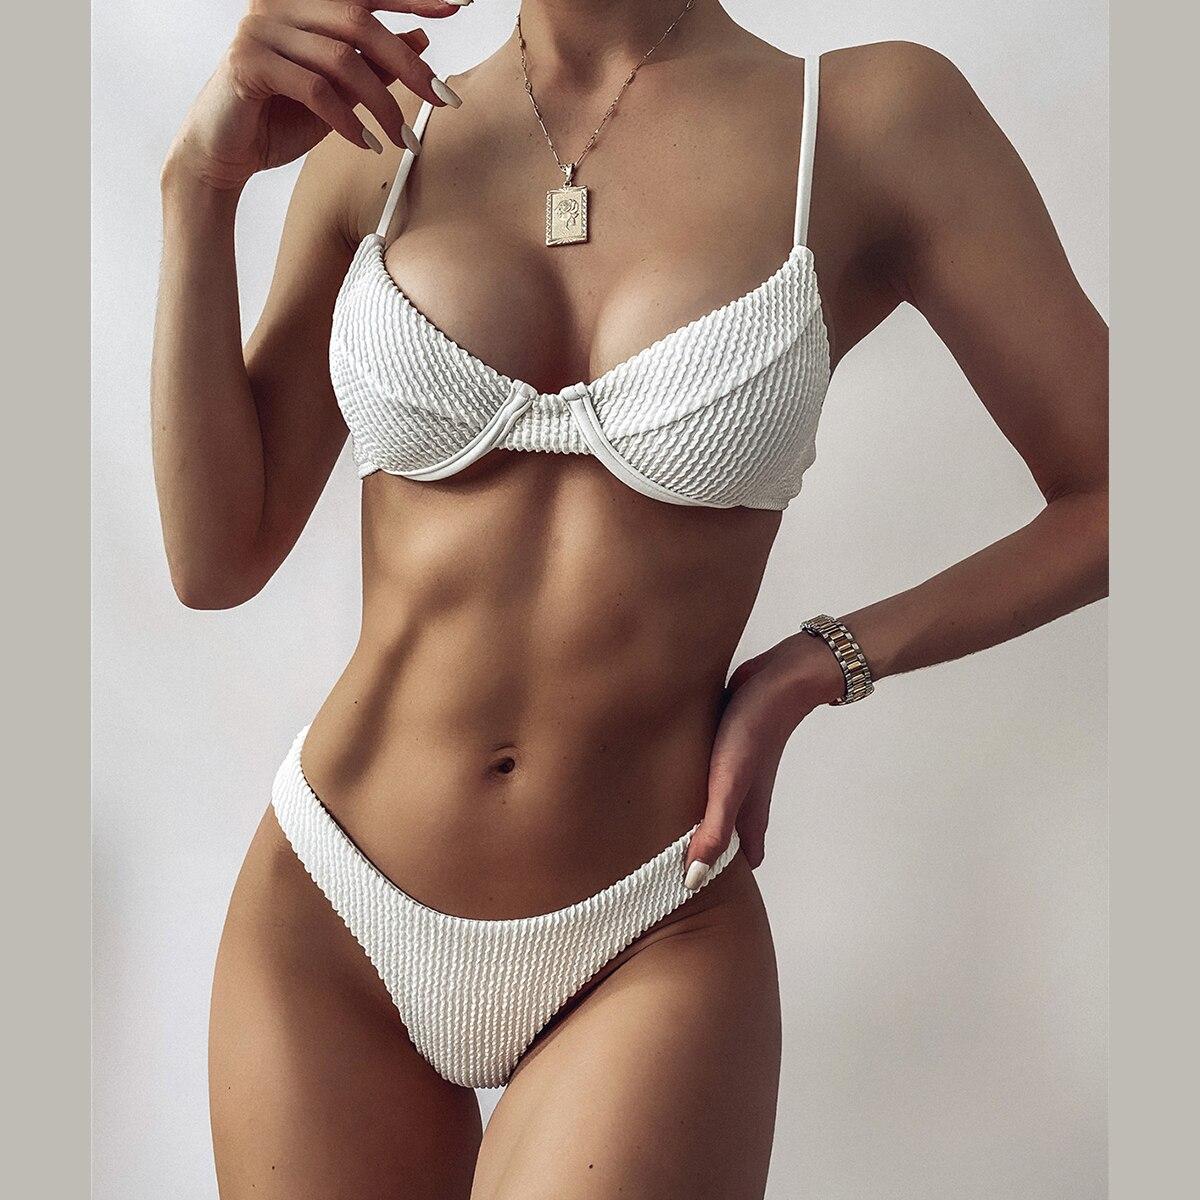 Bikini 2021New Solid Swimsuit Women Swimwear Push Up Bikini Set Patchwork Biquini Brazilian Summer Beach Bathing Suit Swim Wear 2021 sexy women high waist bikini swimsuit swimwear female bandeau thong brazilian biquini bikini set bathing beach suit bather